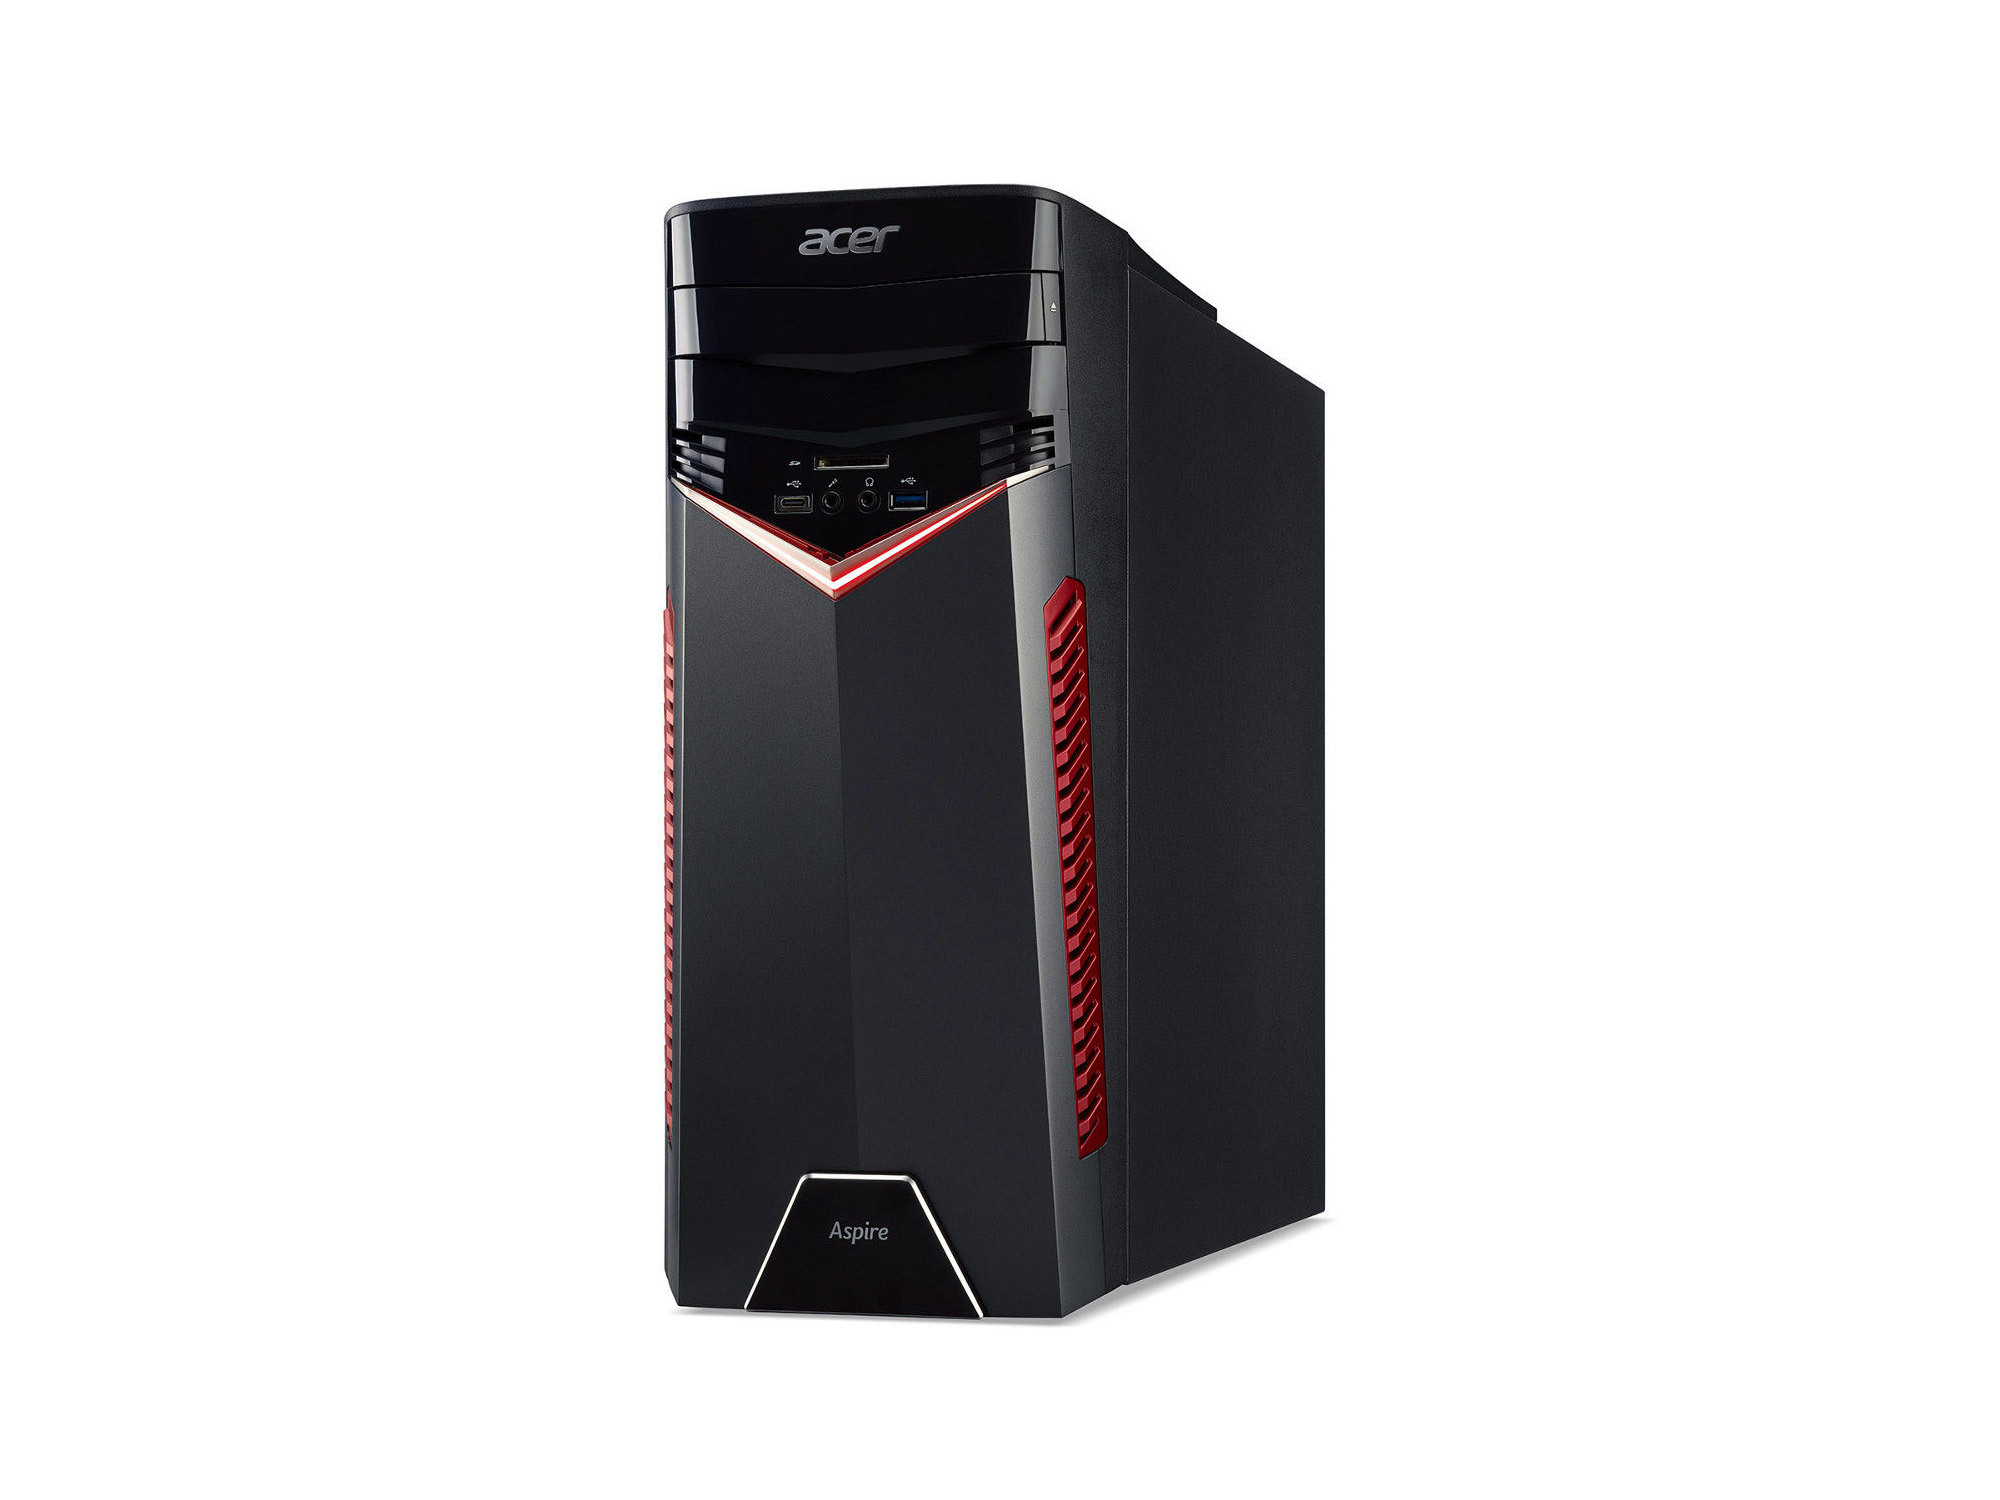 PC fixe Gamer - AMD Ryzen 5 1400 - RAM 8 Go - HDD 1 To - NVIDIA GeForce GTX 1060 3 Go - DVD - Windows 10